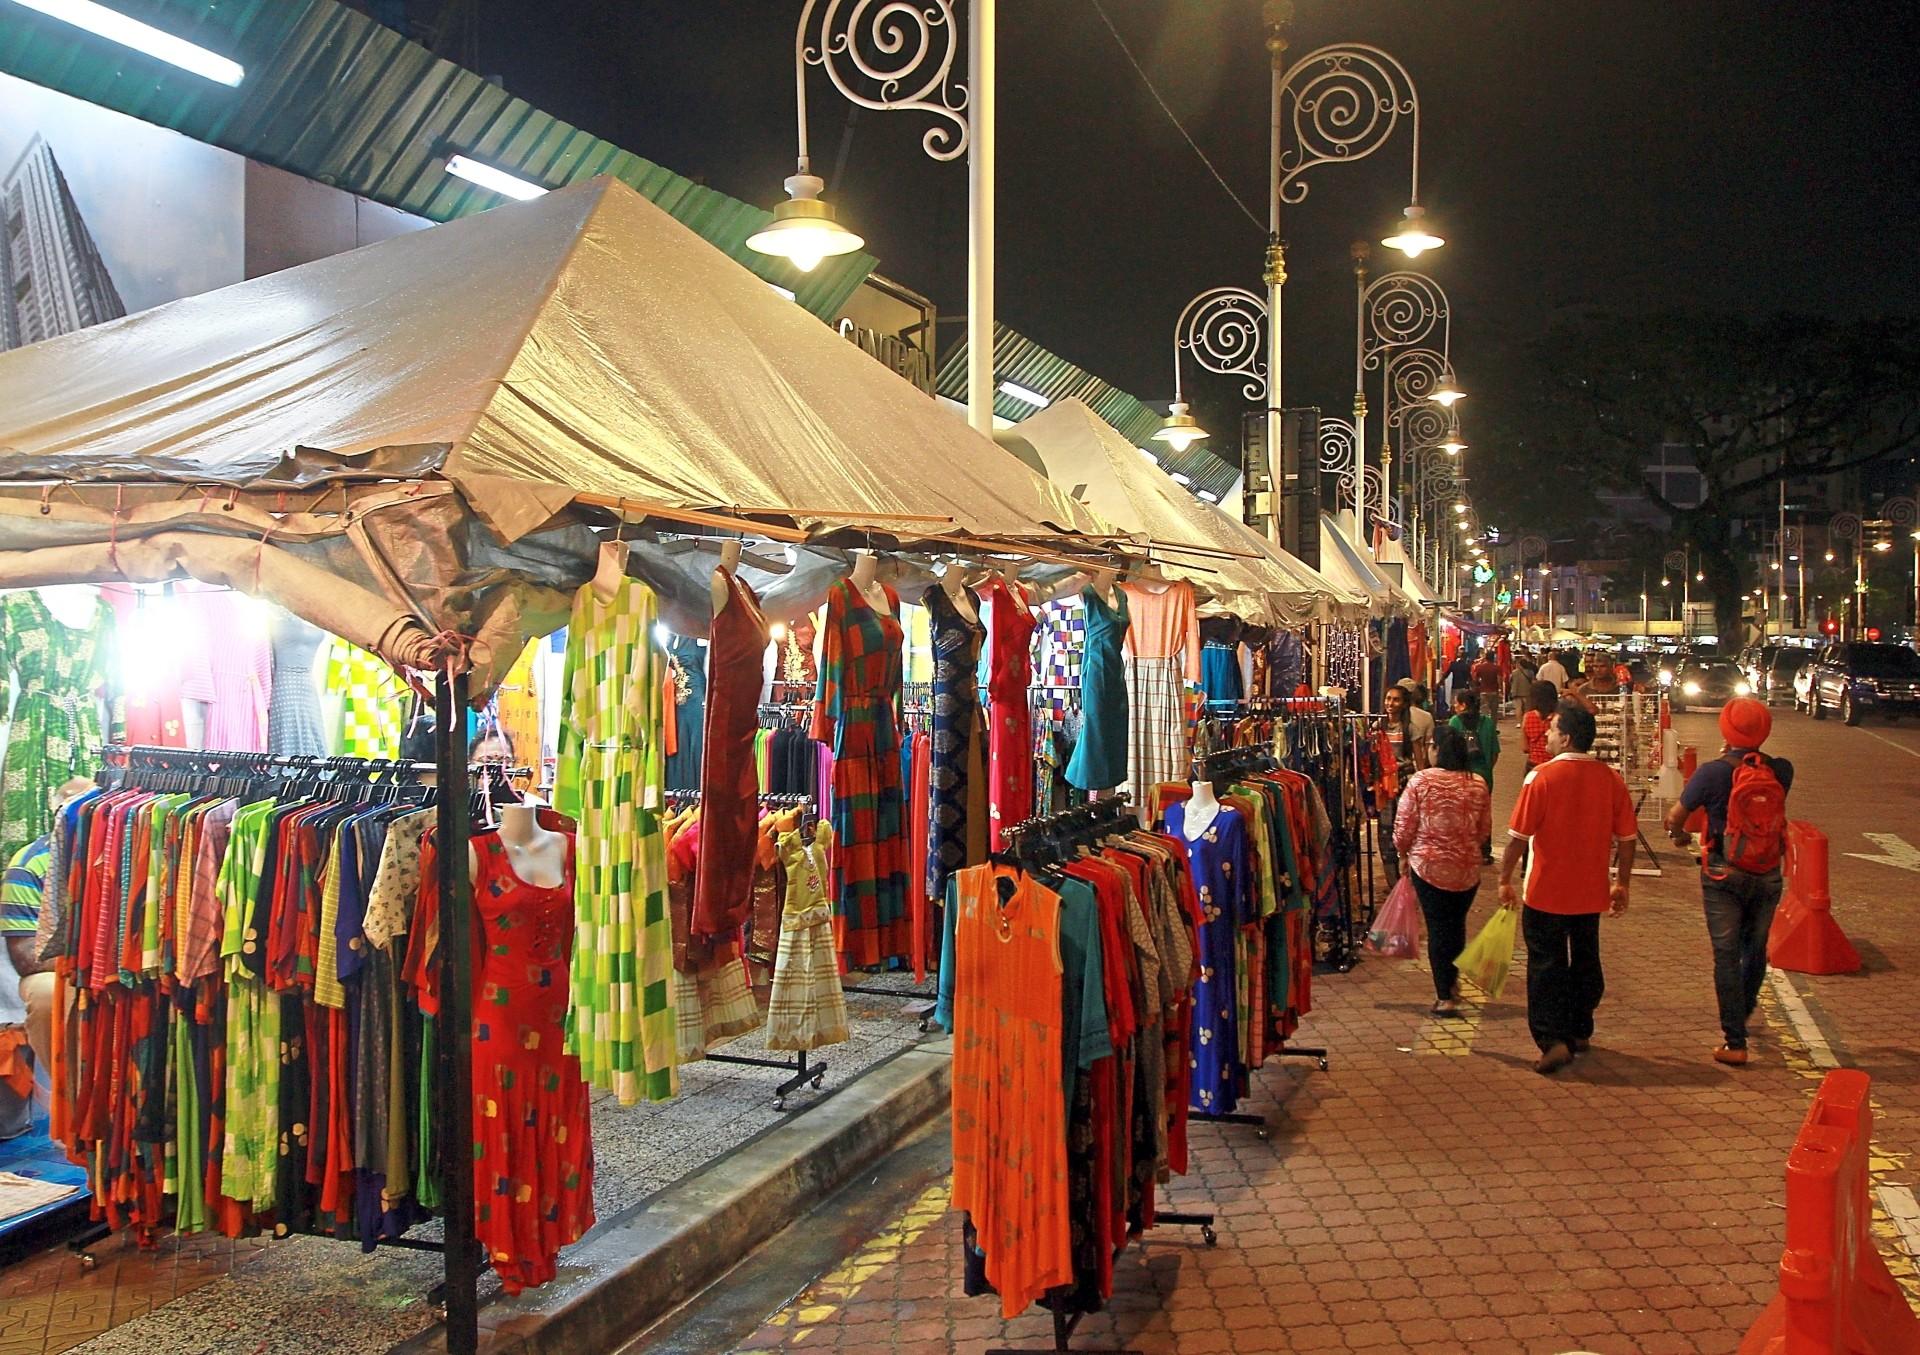 Traders operating at Jalan Tun Sambanthan in Brickfields started selling their goods last week.